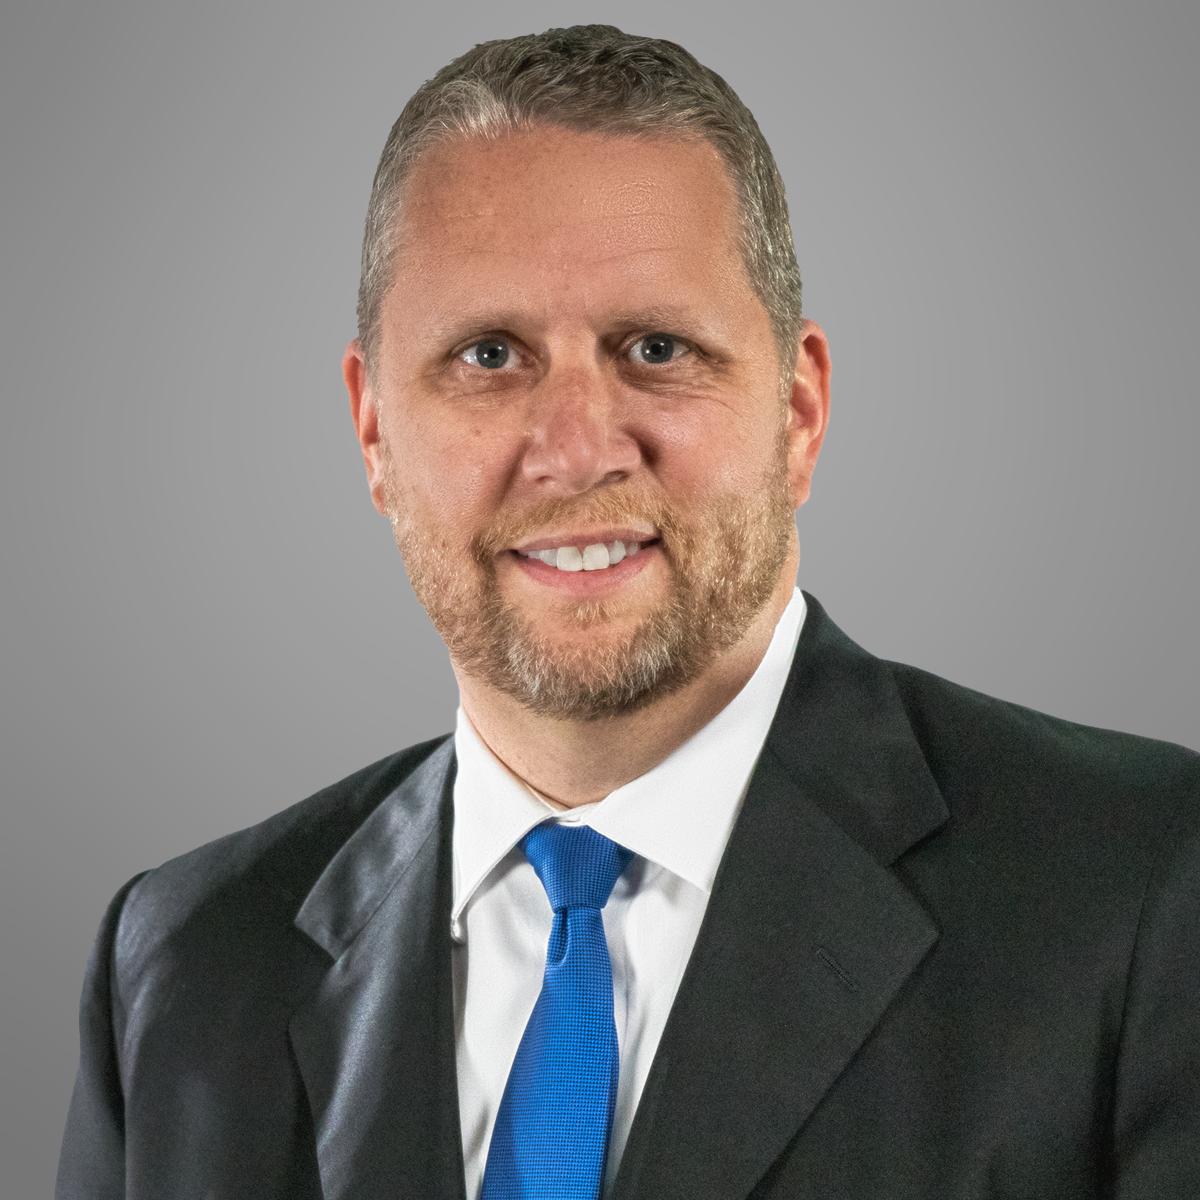 Michael Fradin DWI Attorney Winston Salem NC